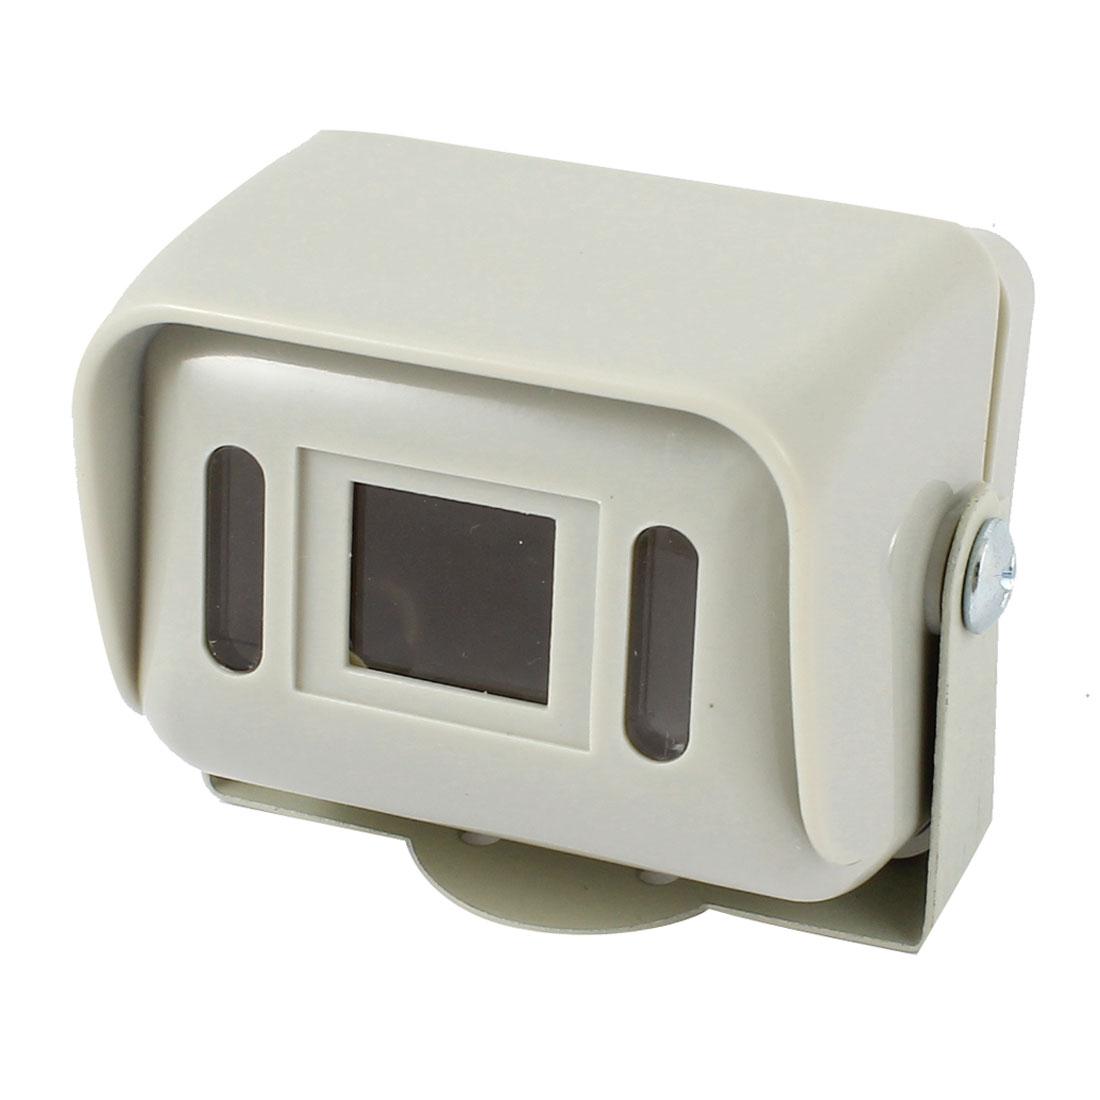 Car Rear View Surveillance Gray Plastic CCTV Camera Housing Case